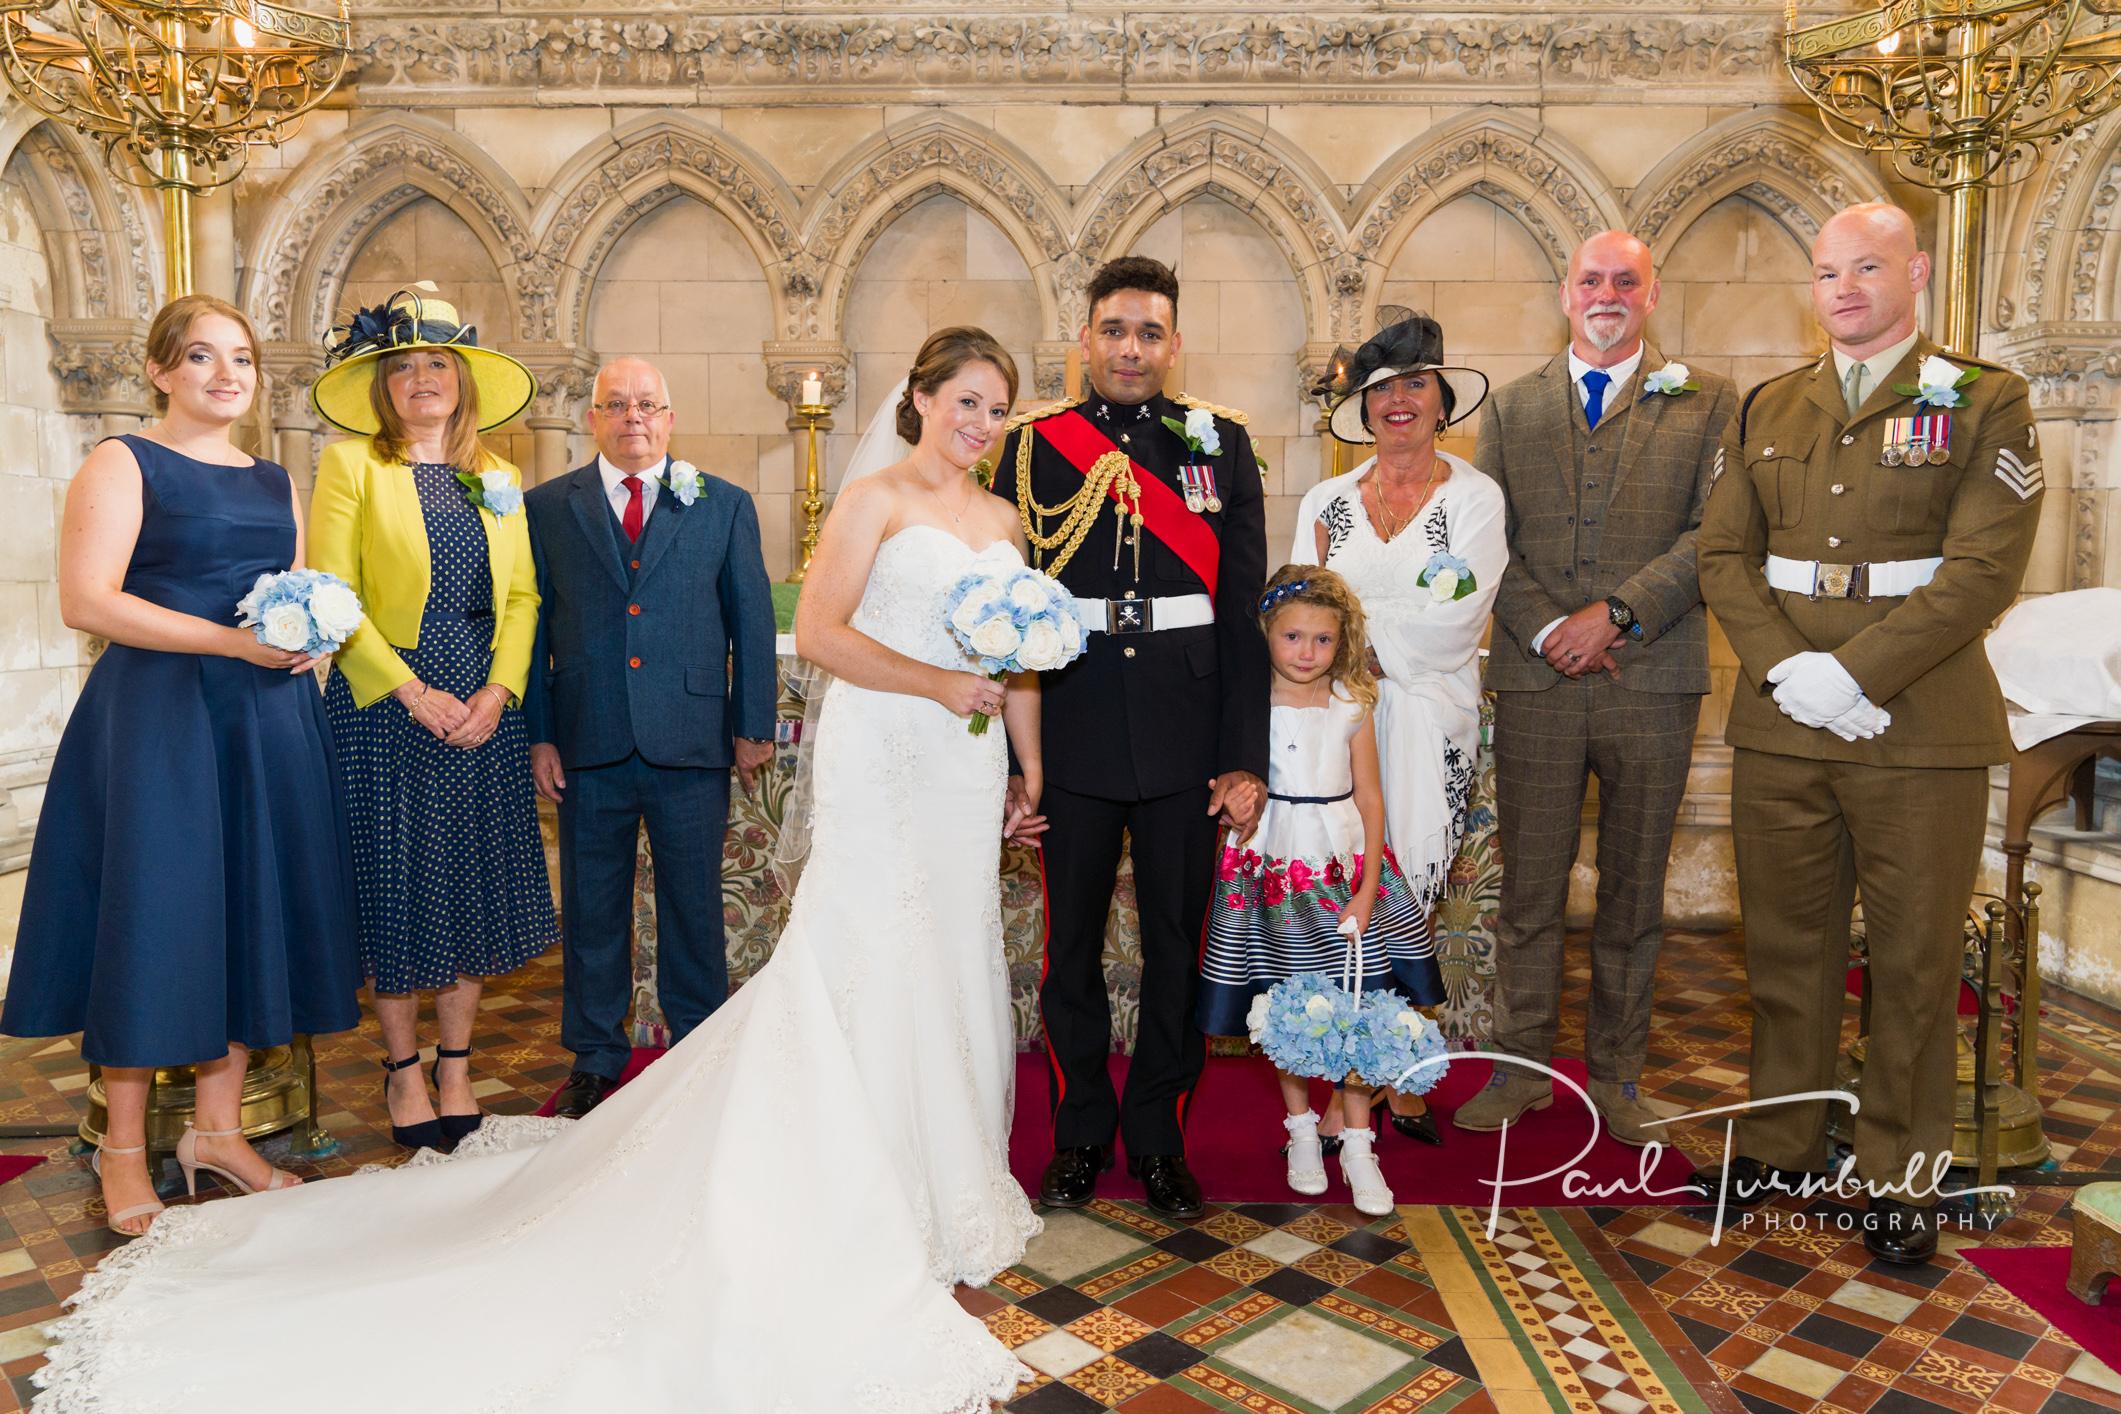 wedding-photographer-south-dalton-walkington-yorkshire-emma-james-035.jpg